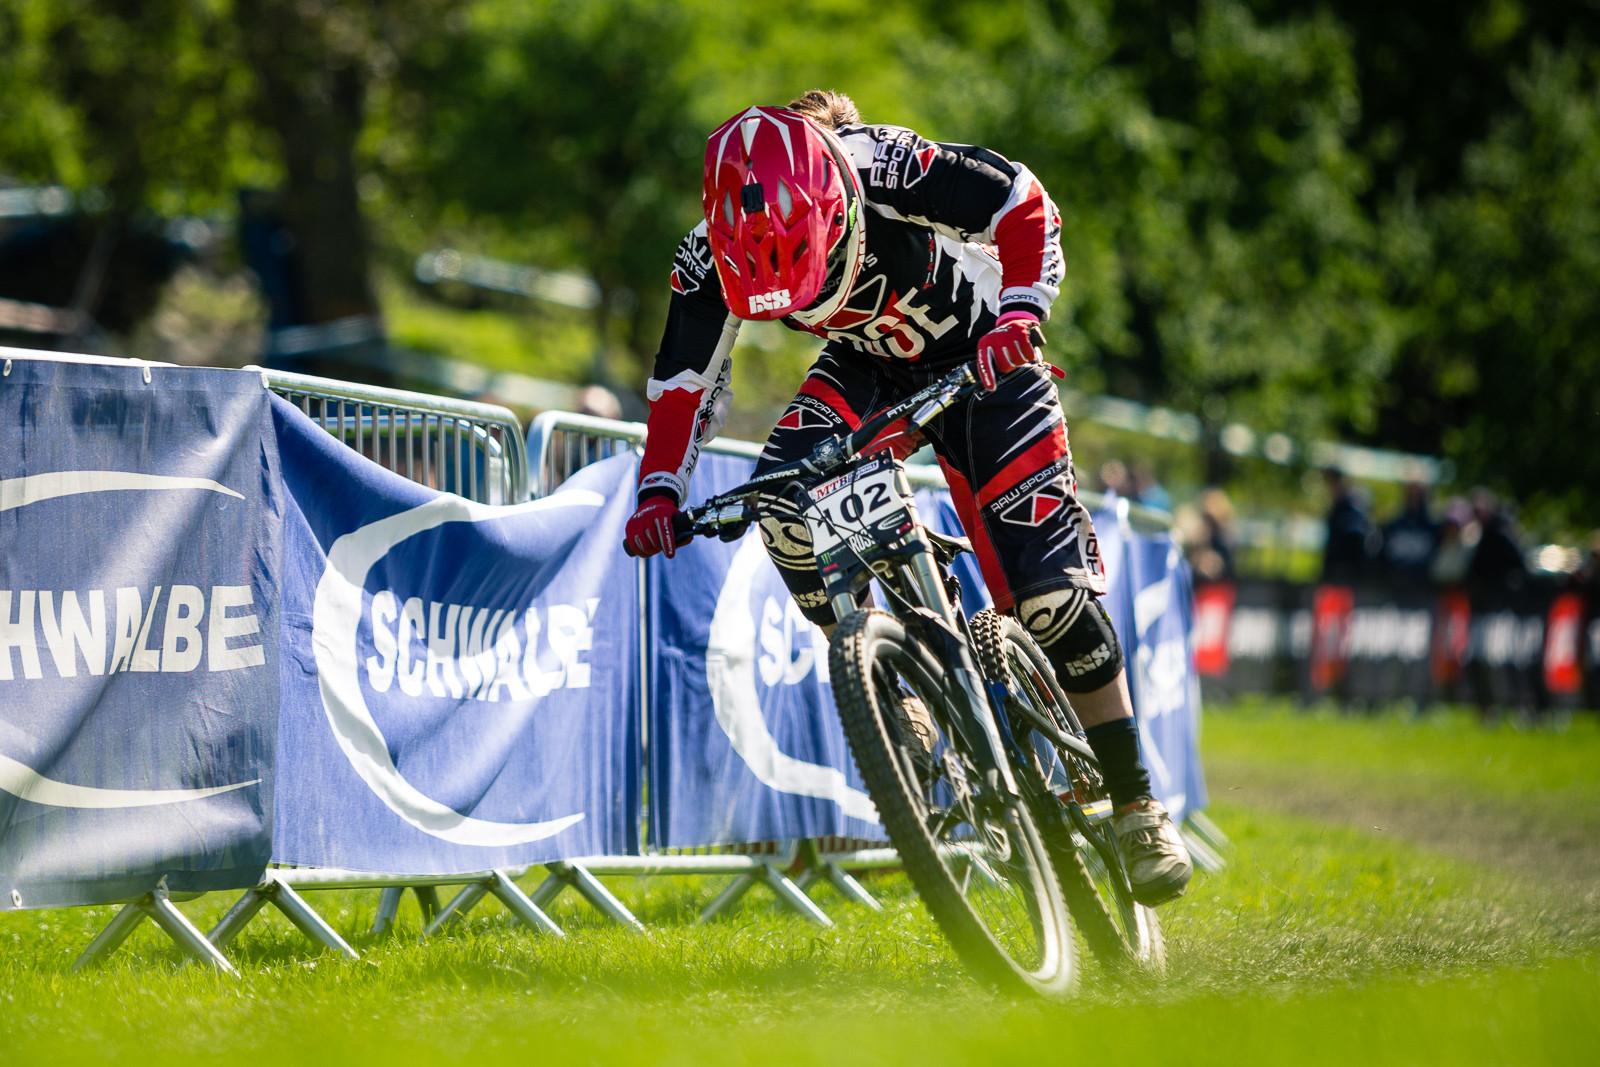 Katy Curd, British Downhill Series Langollen - RACE REPORT - British Downhill Series Llangollen - Mountain Biking Pictures - Vital MTB